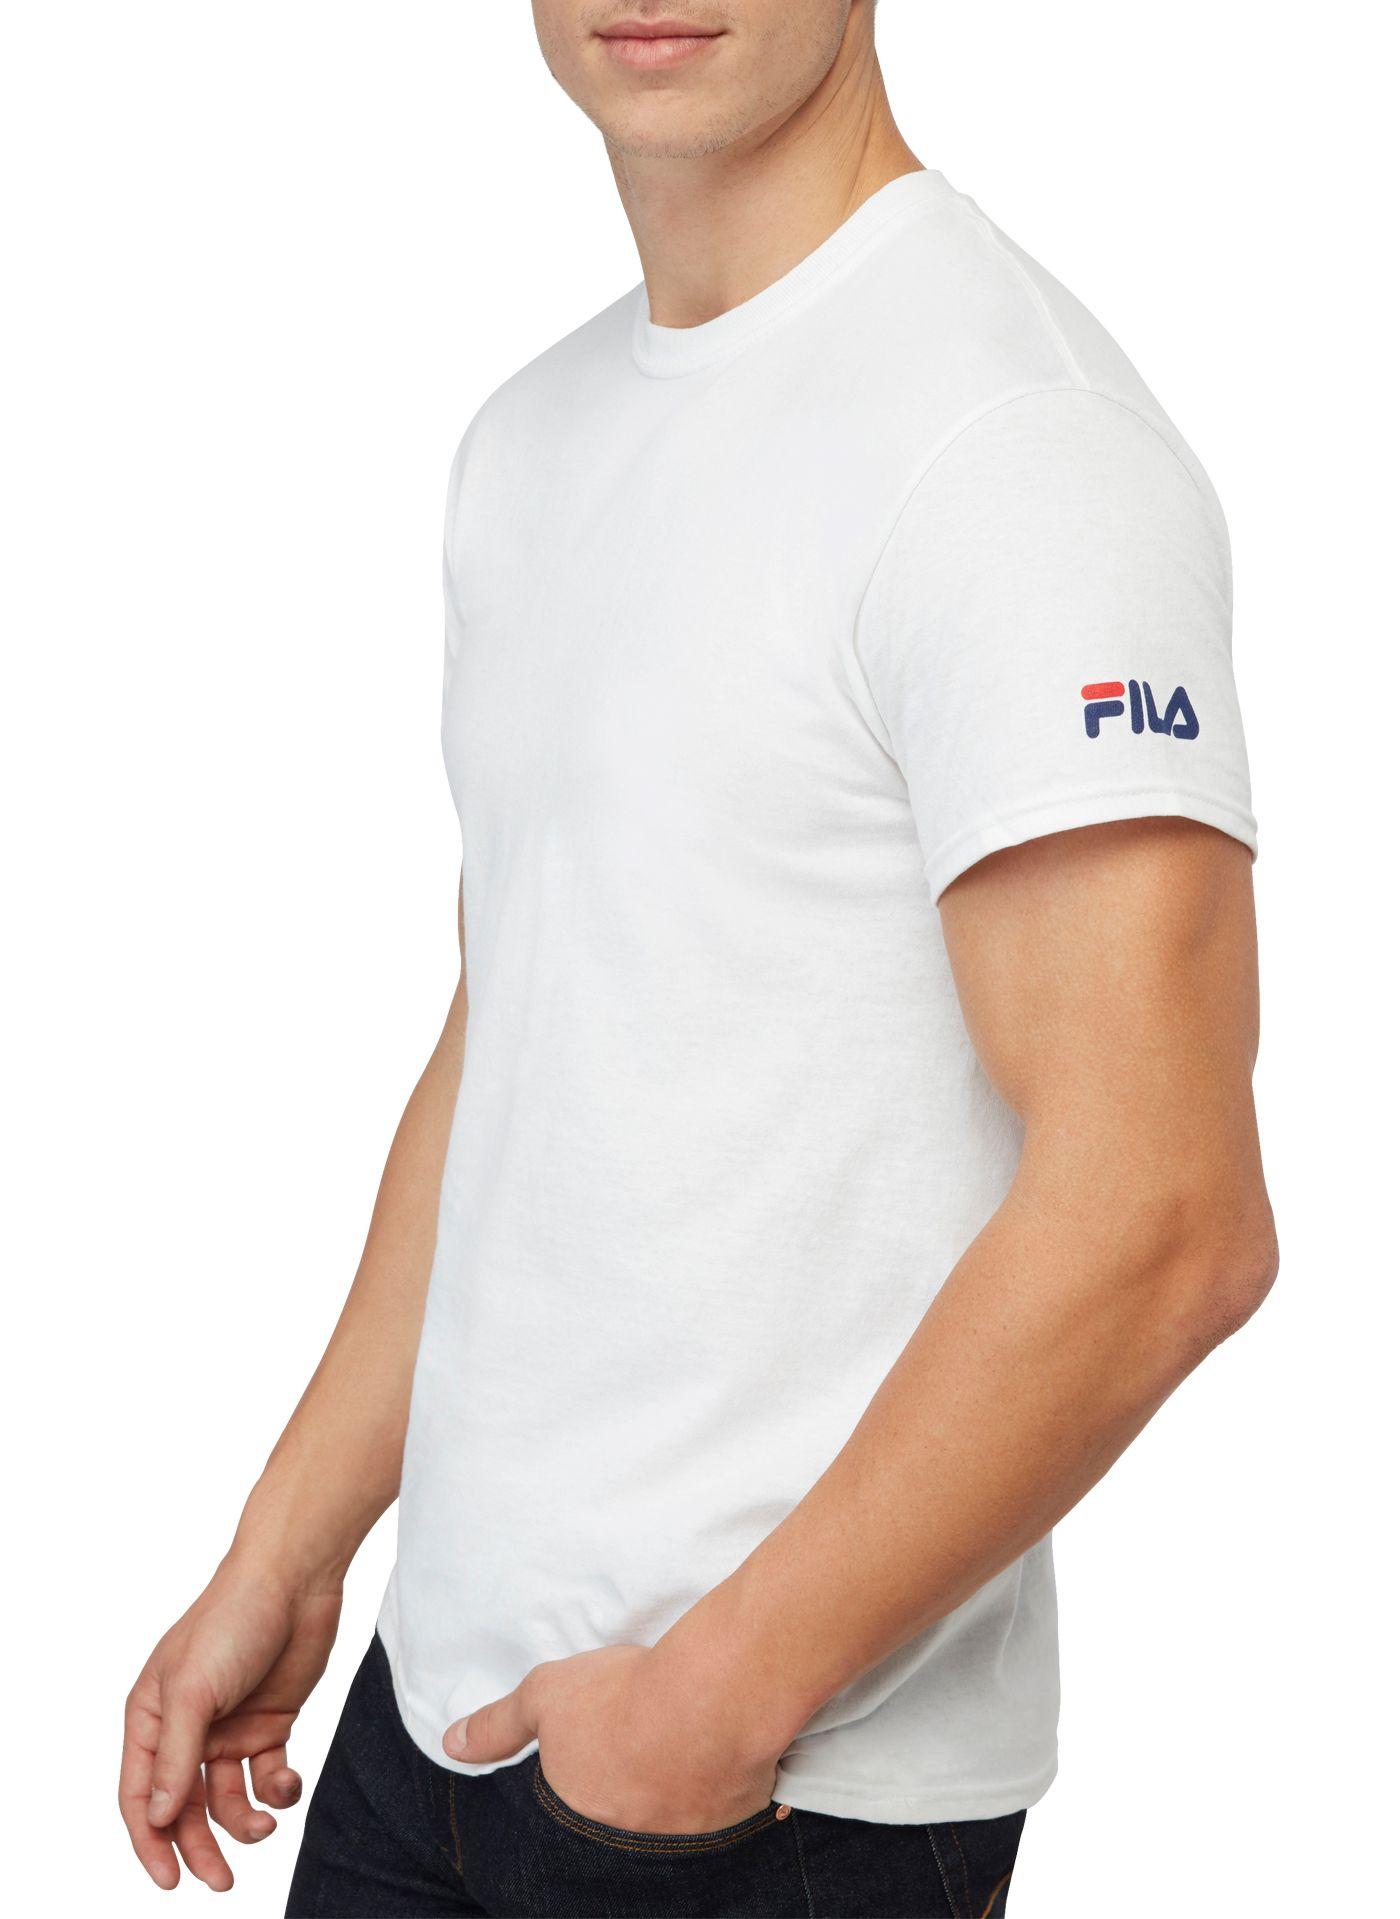 Fila Men's Camp Tennis T-Shirt